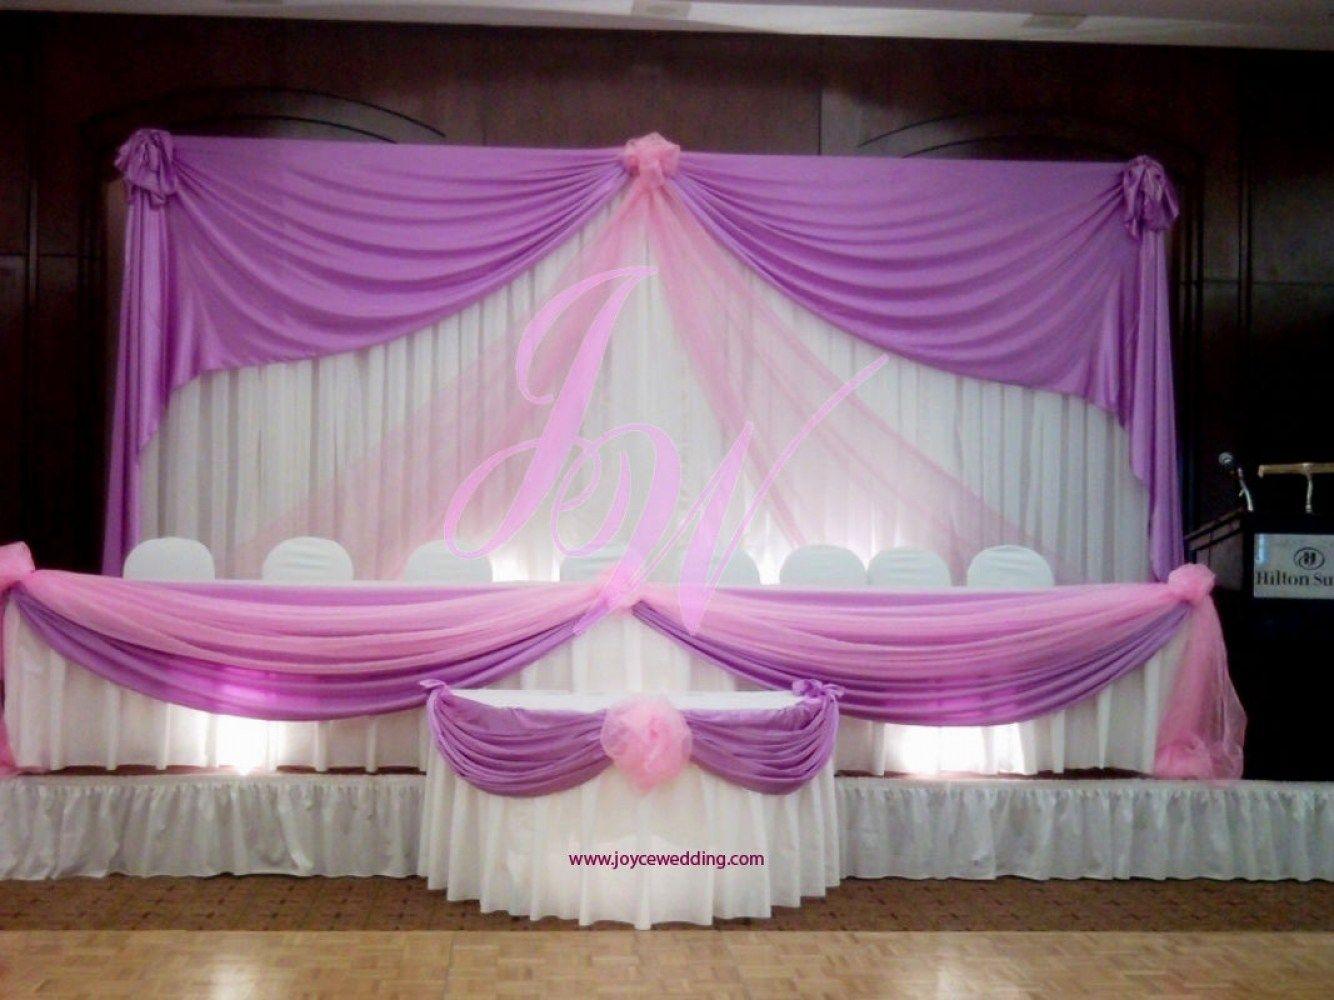 32 purple and white decoration for wedding decoration wedding and 30 purple and white decoration for wedding junglespirit Choice Image